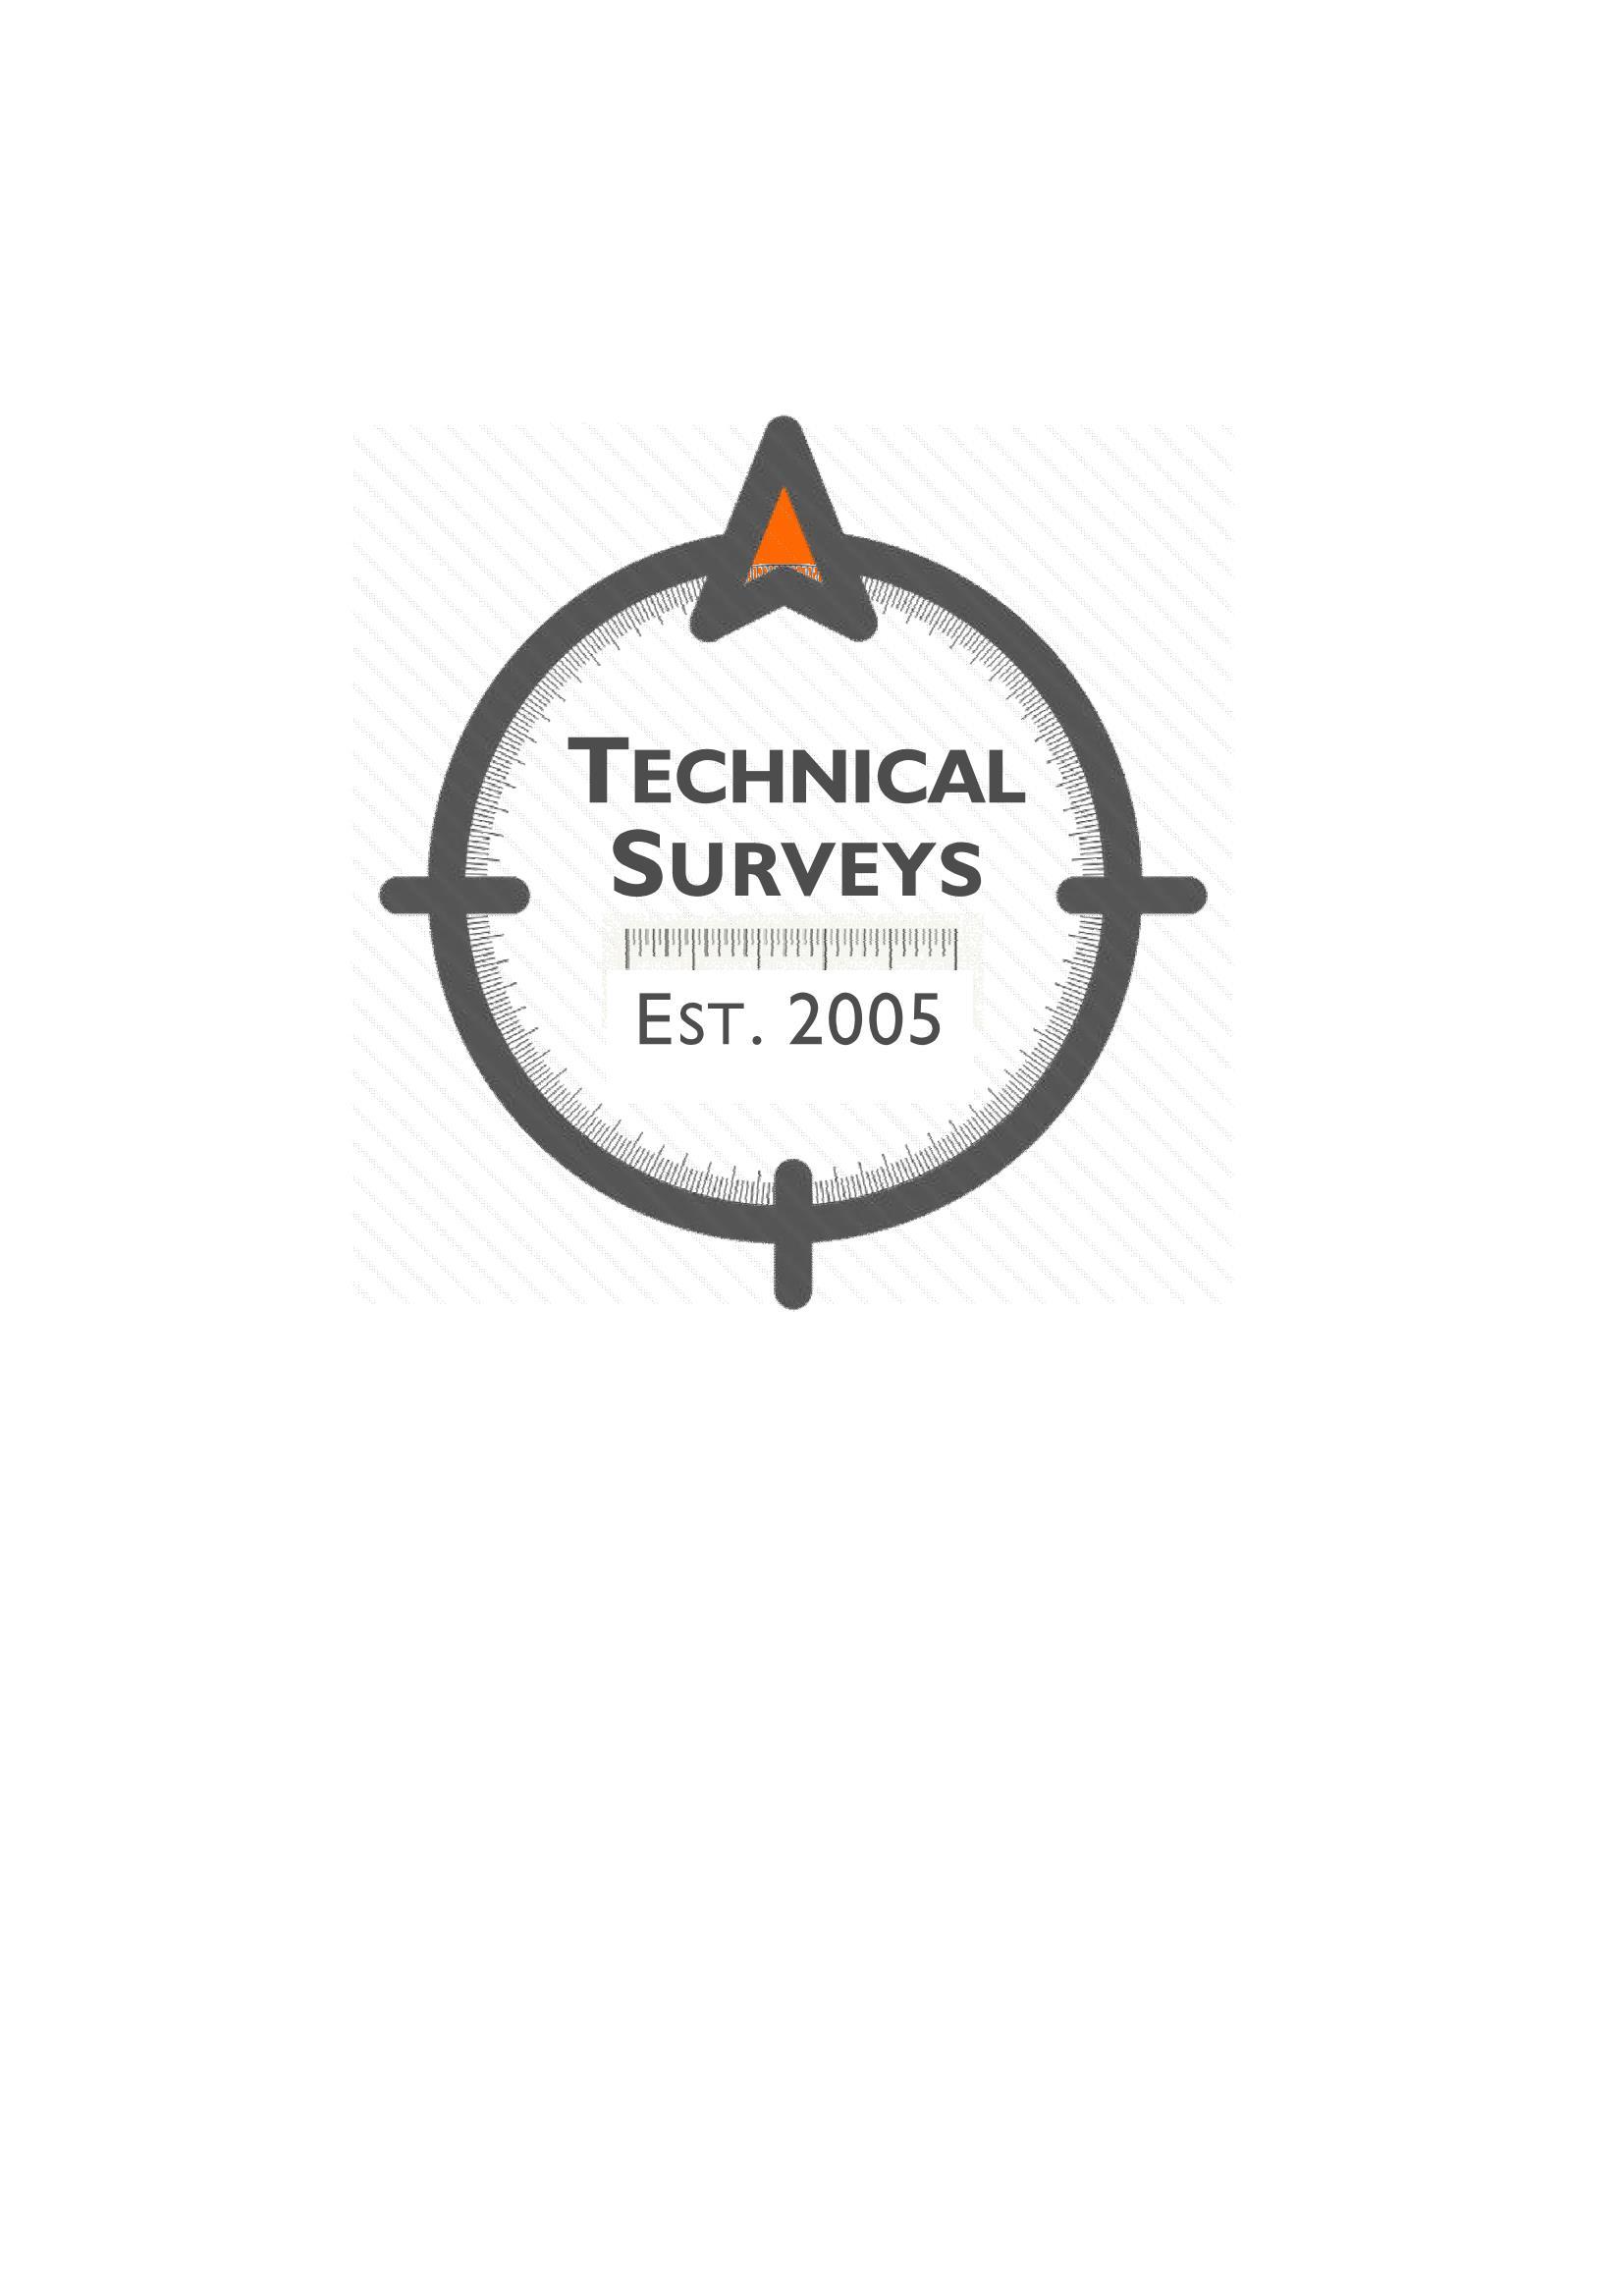 Technical Surveys